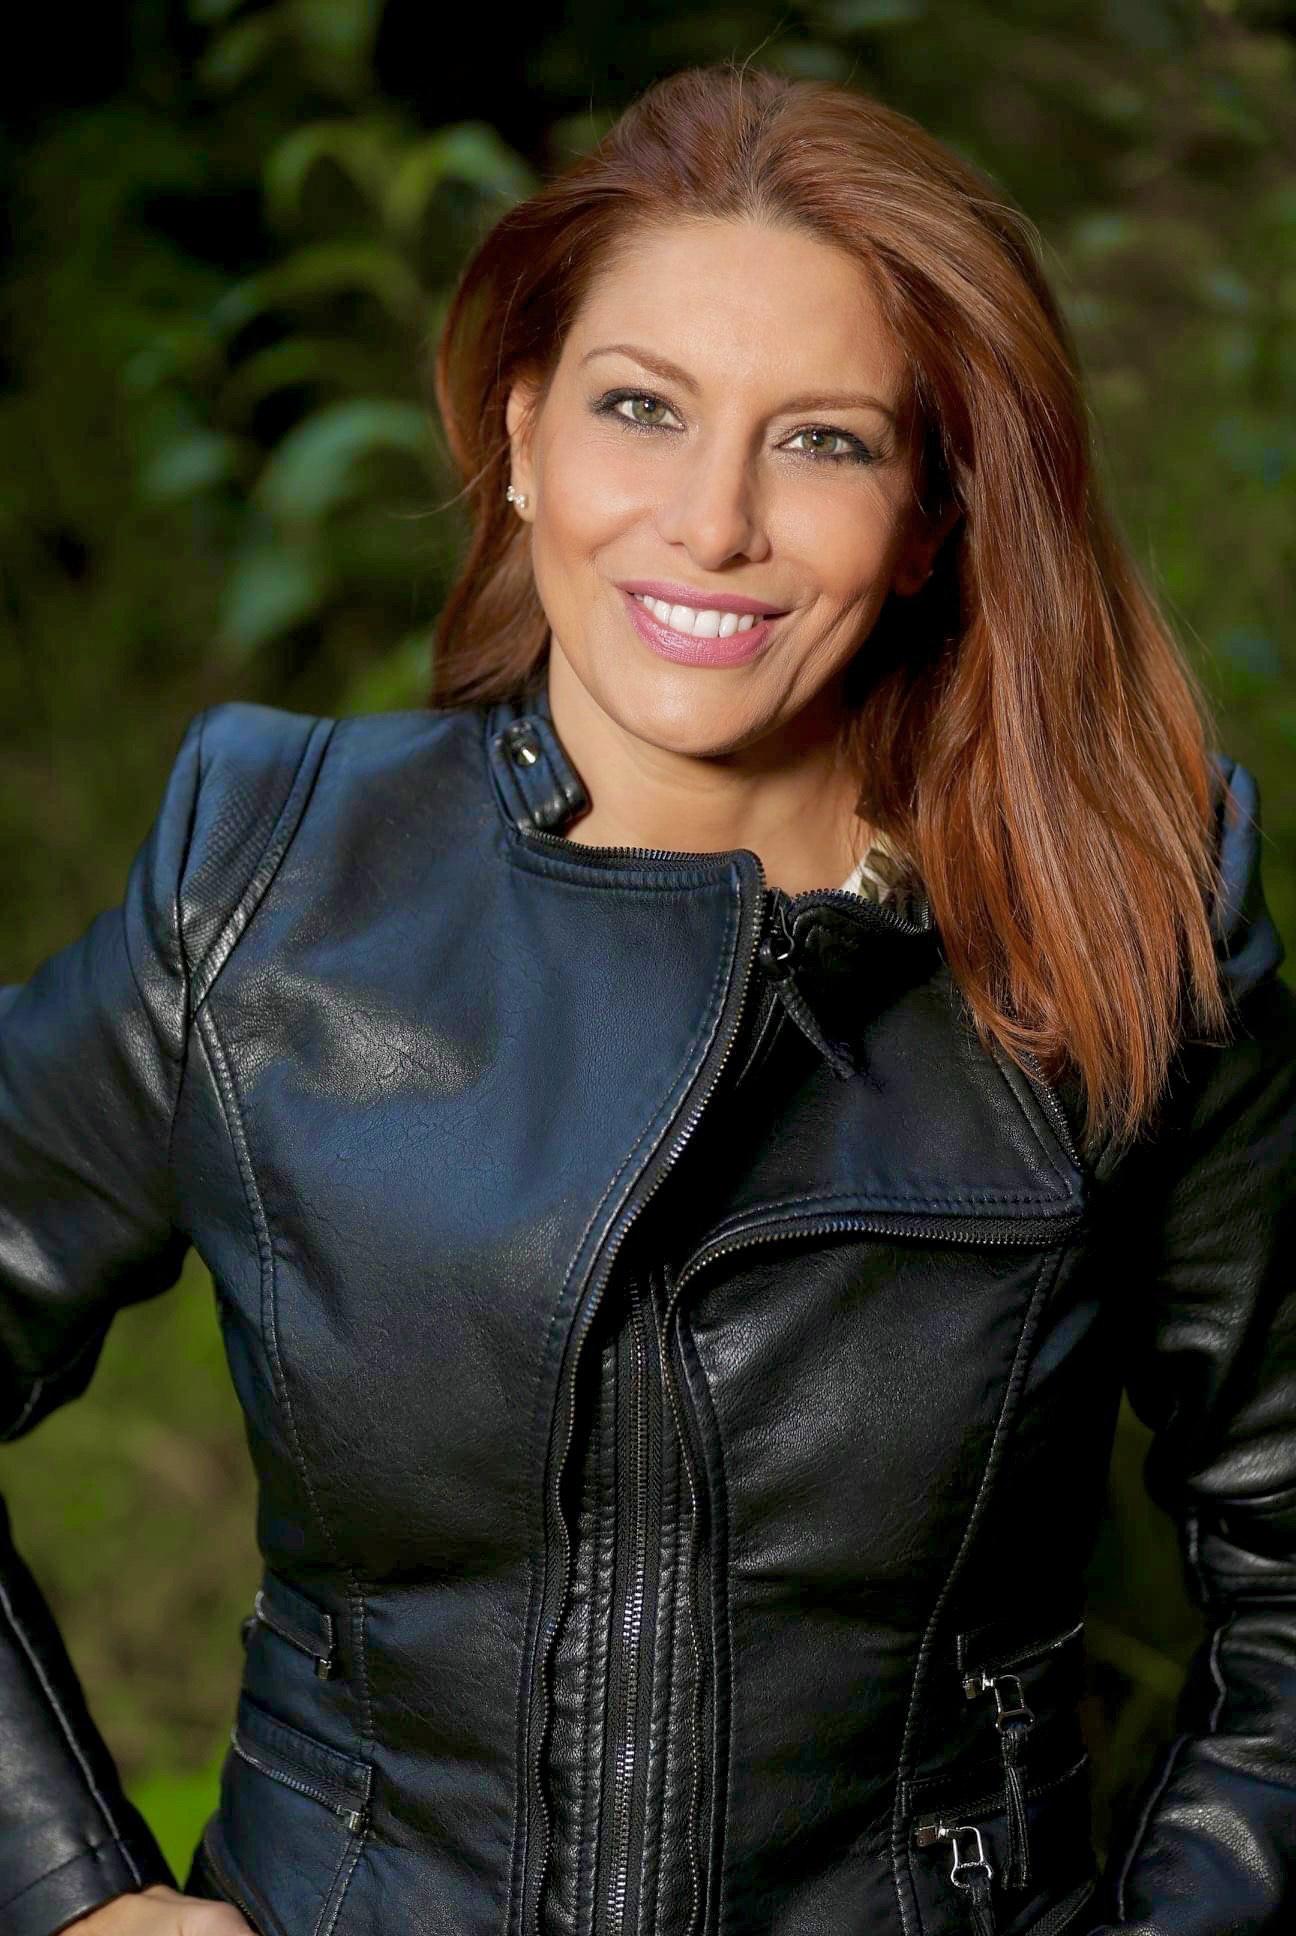 Valentina Gemelli